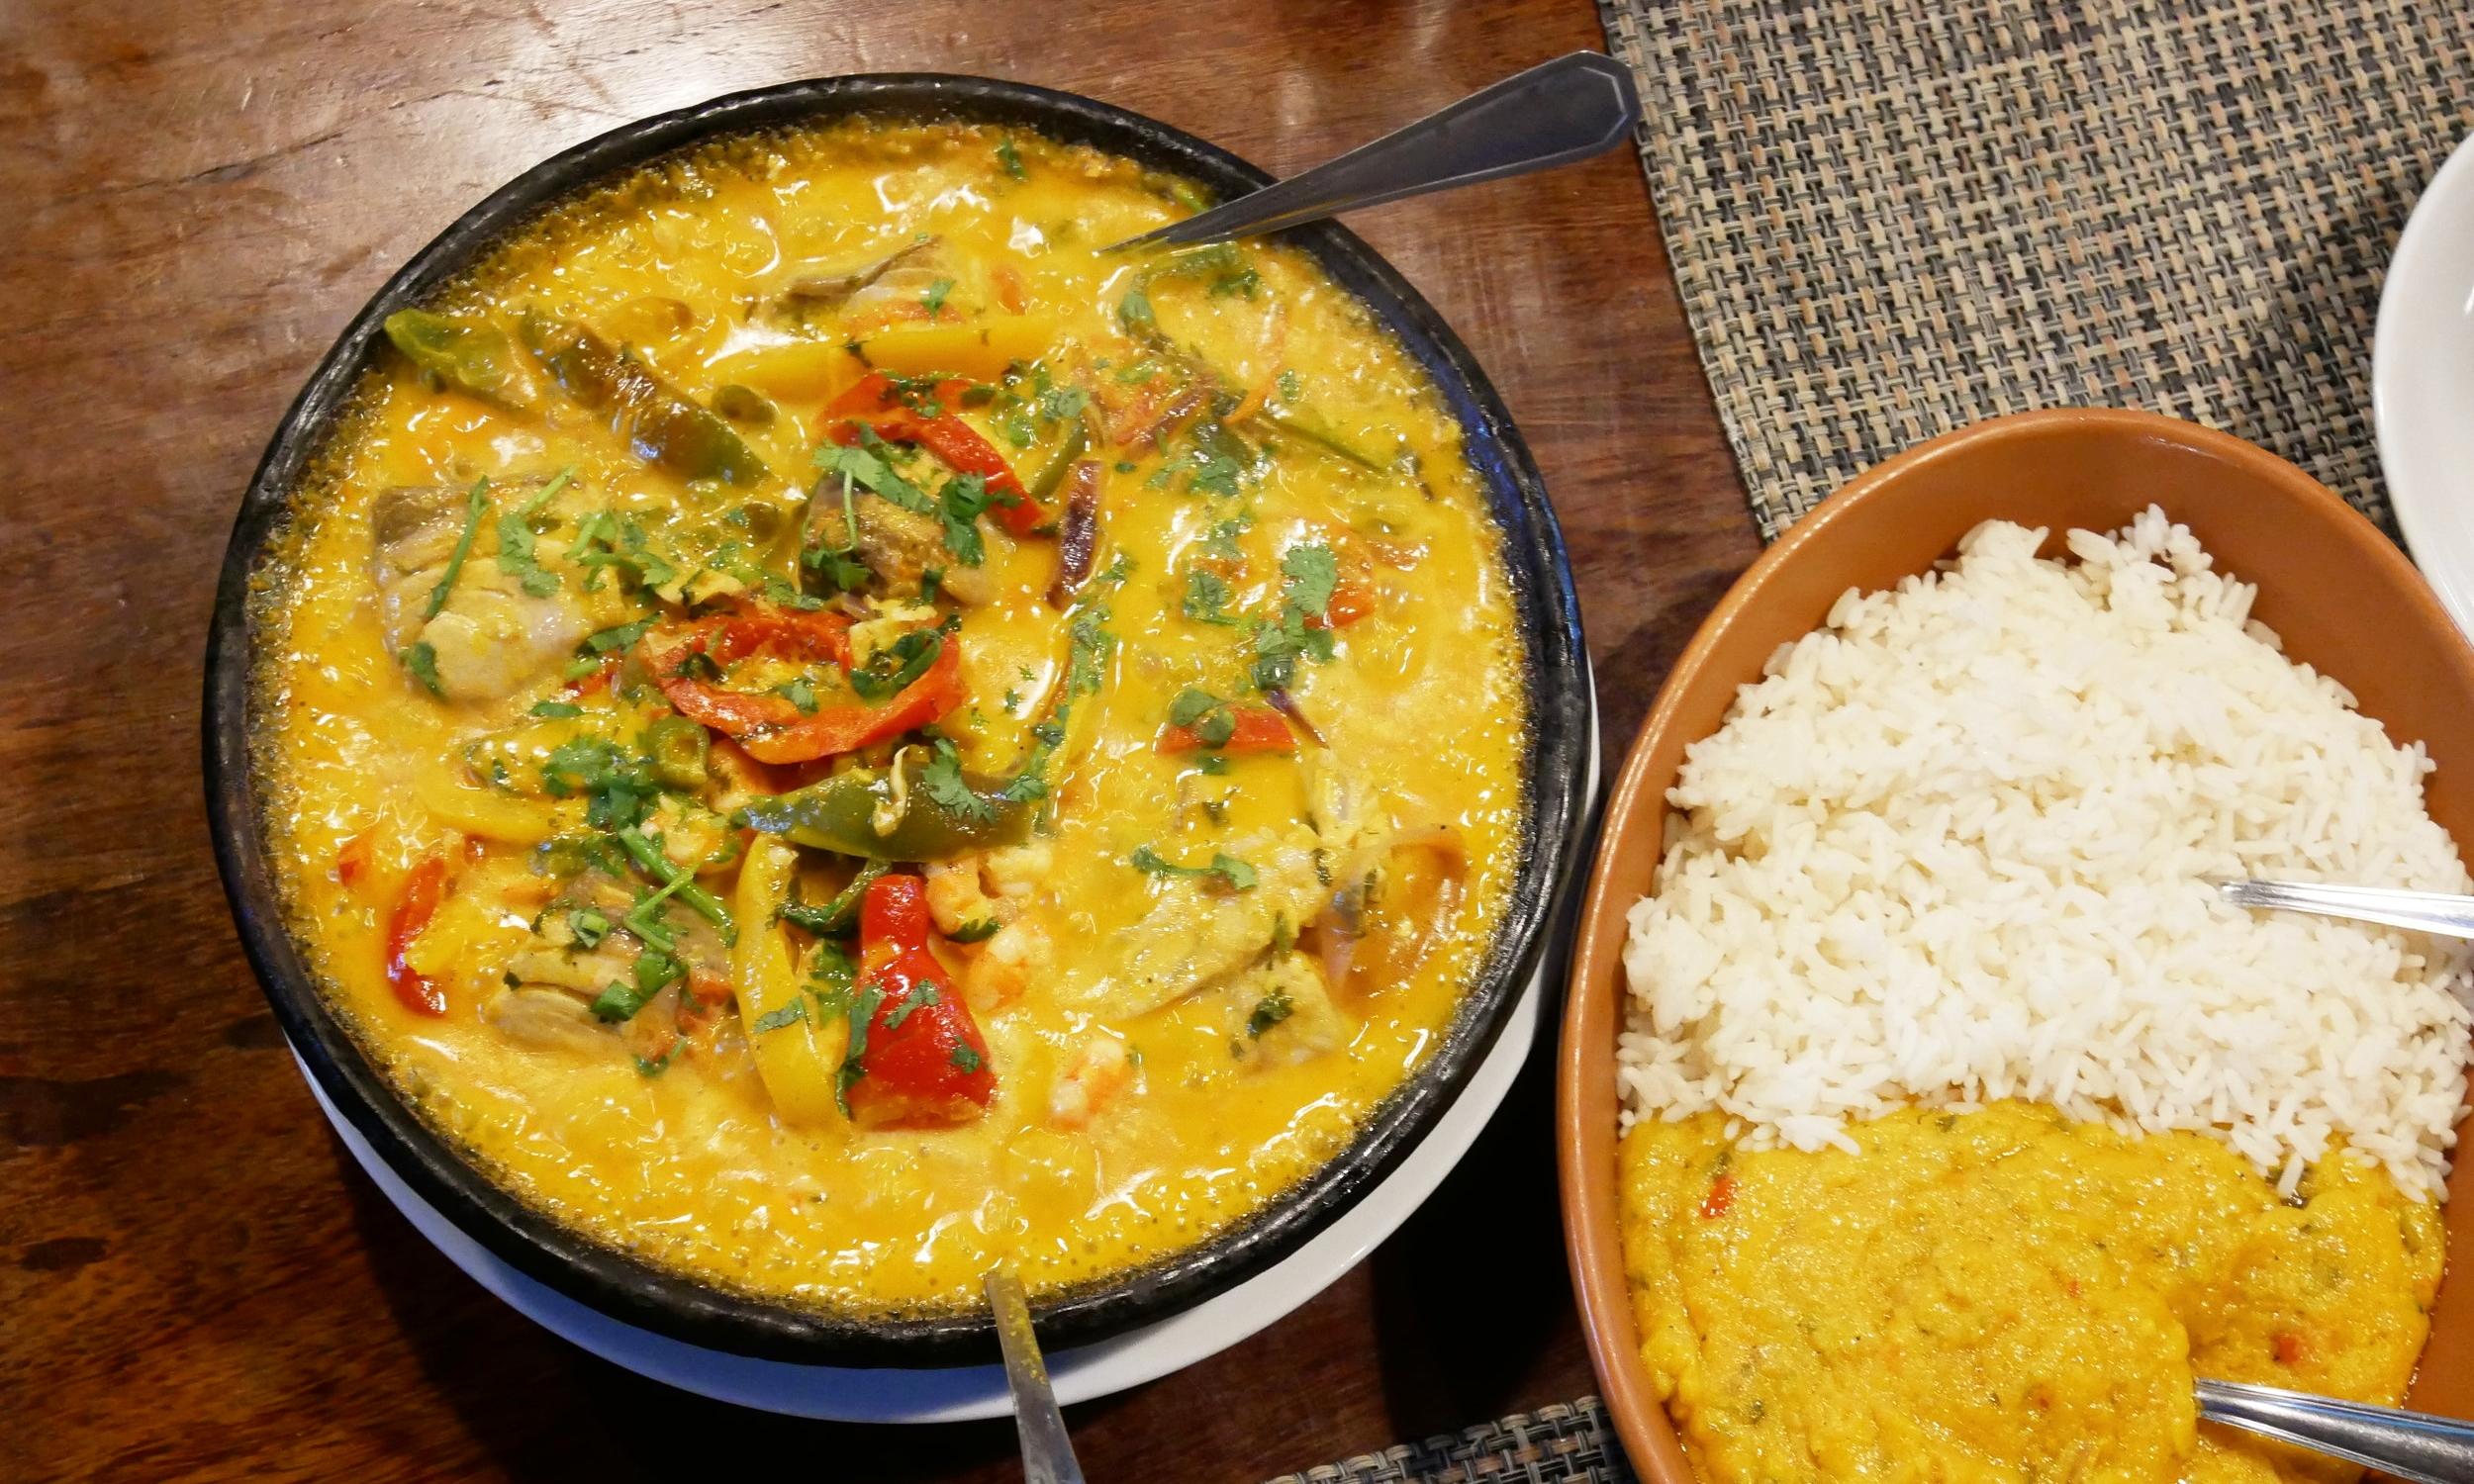 Delicious moqueca, a traditional Bahian dish